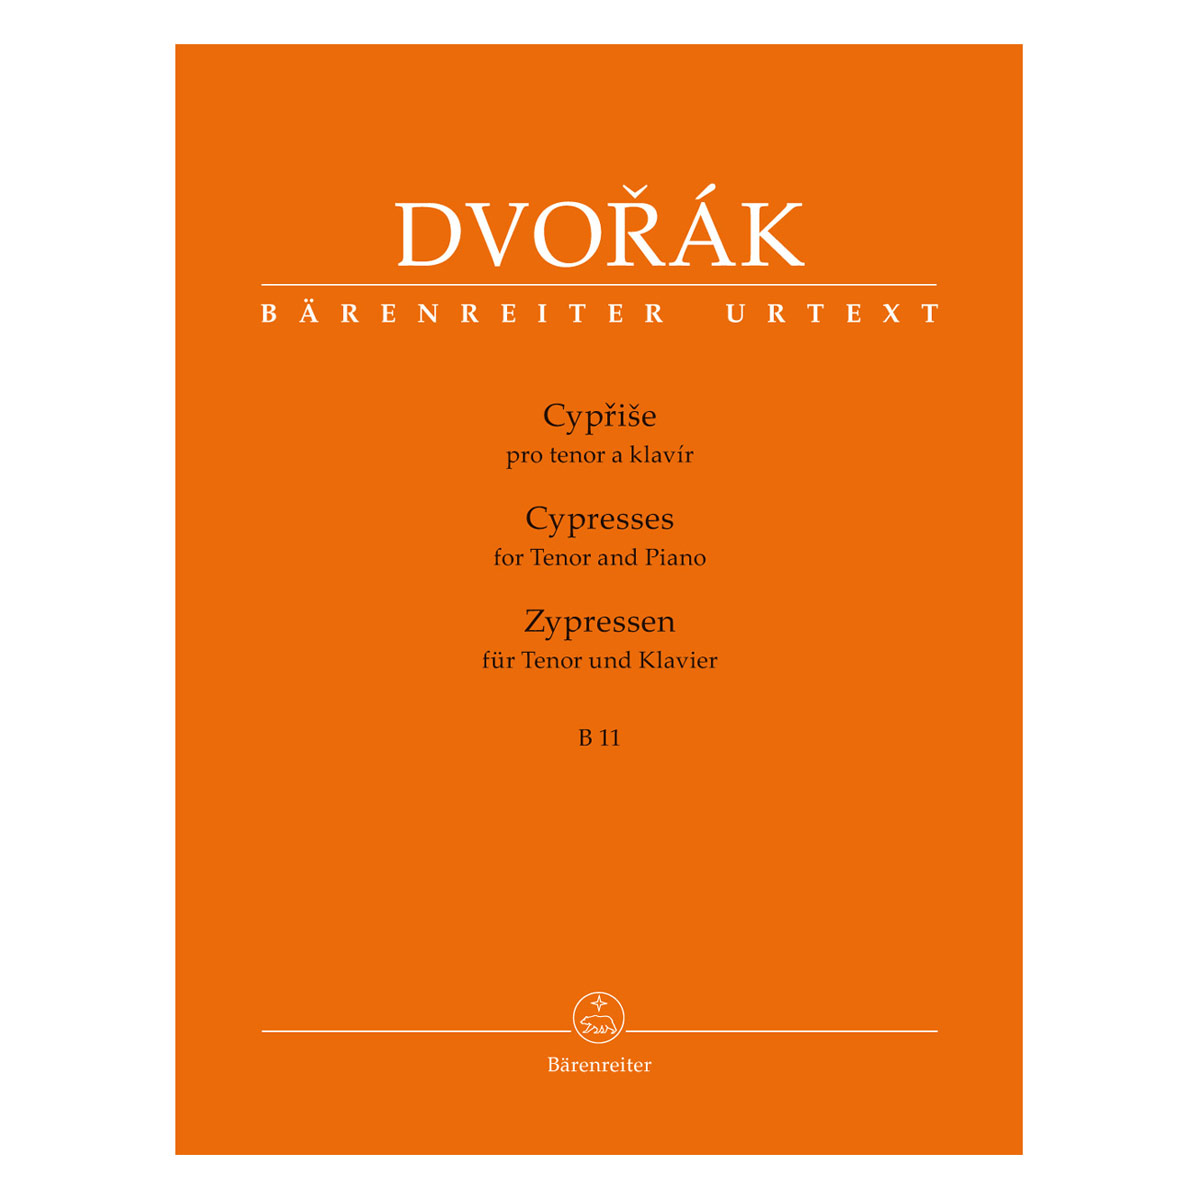 Dvorak A. - Cypresses B 11 - For Tenor and Piano